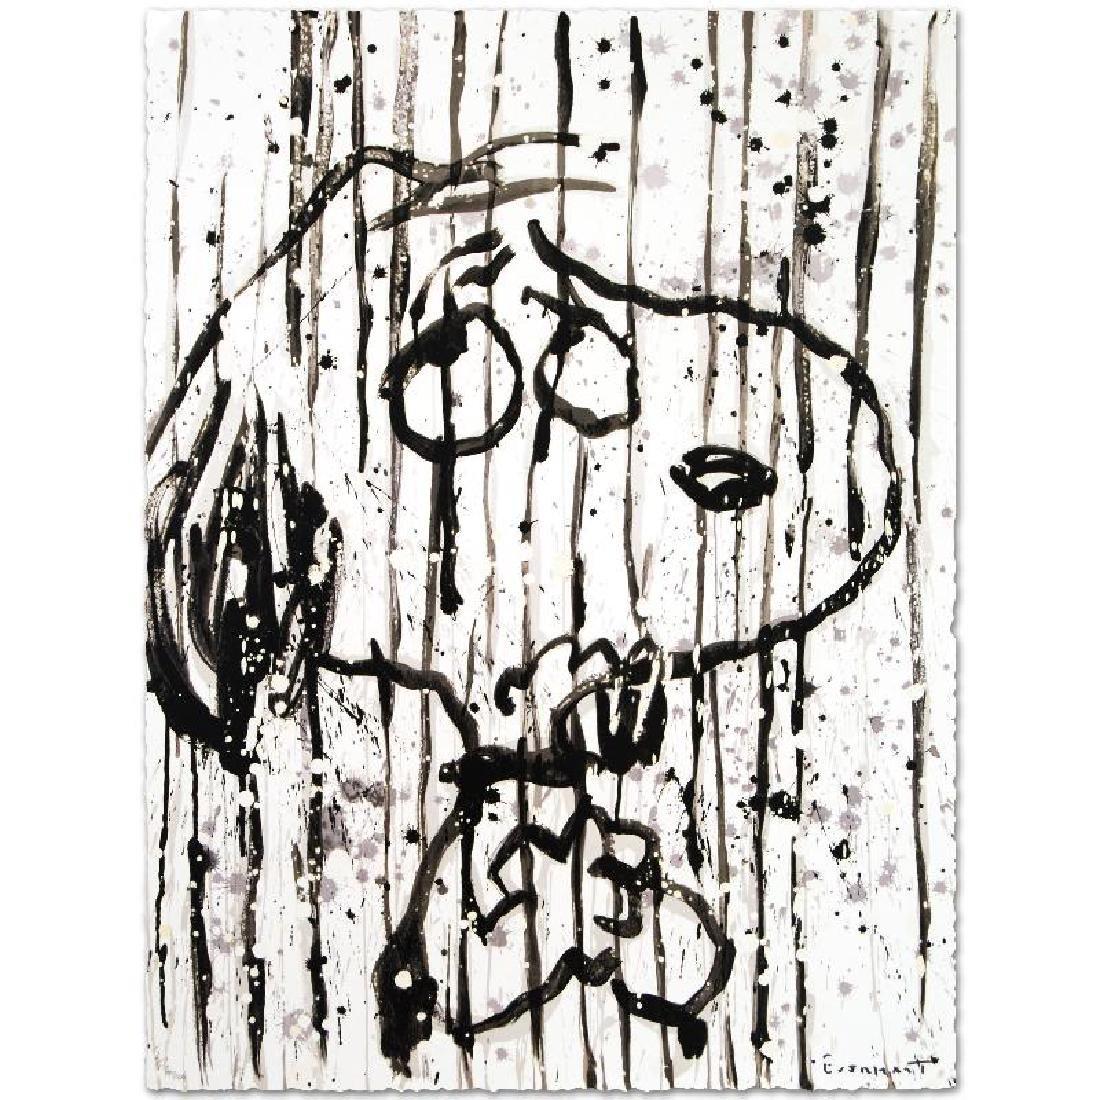 Dancing In The Rain by Everhart, Tom